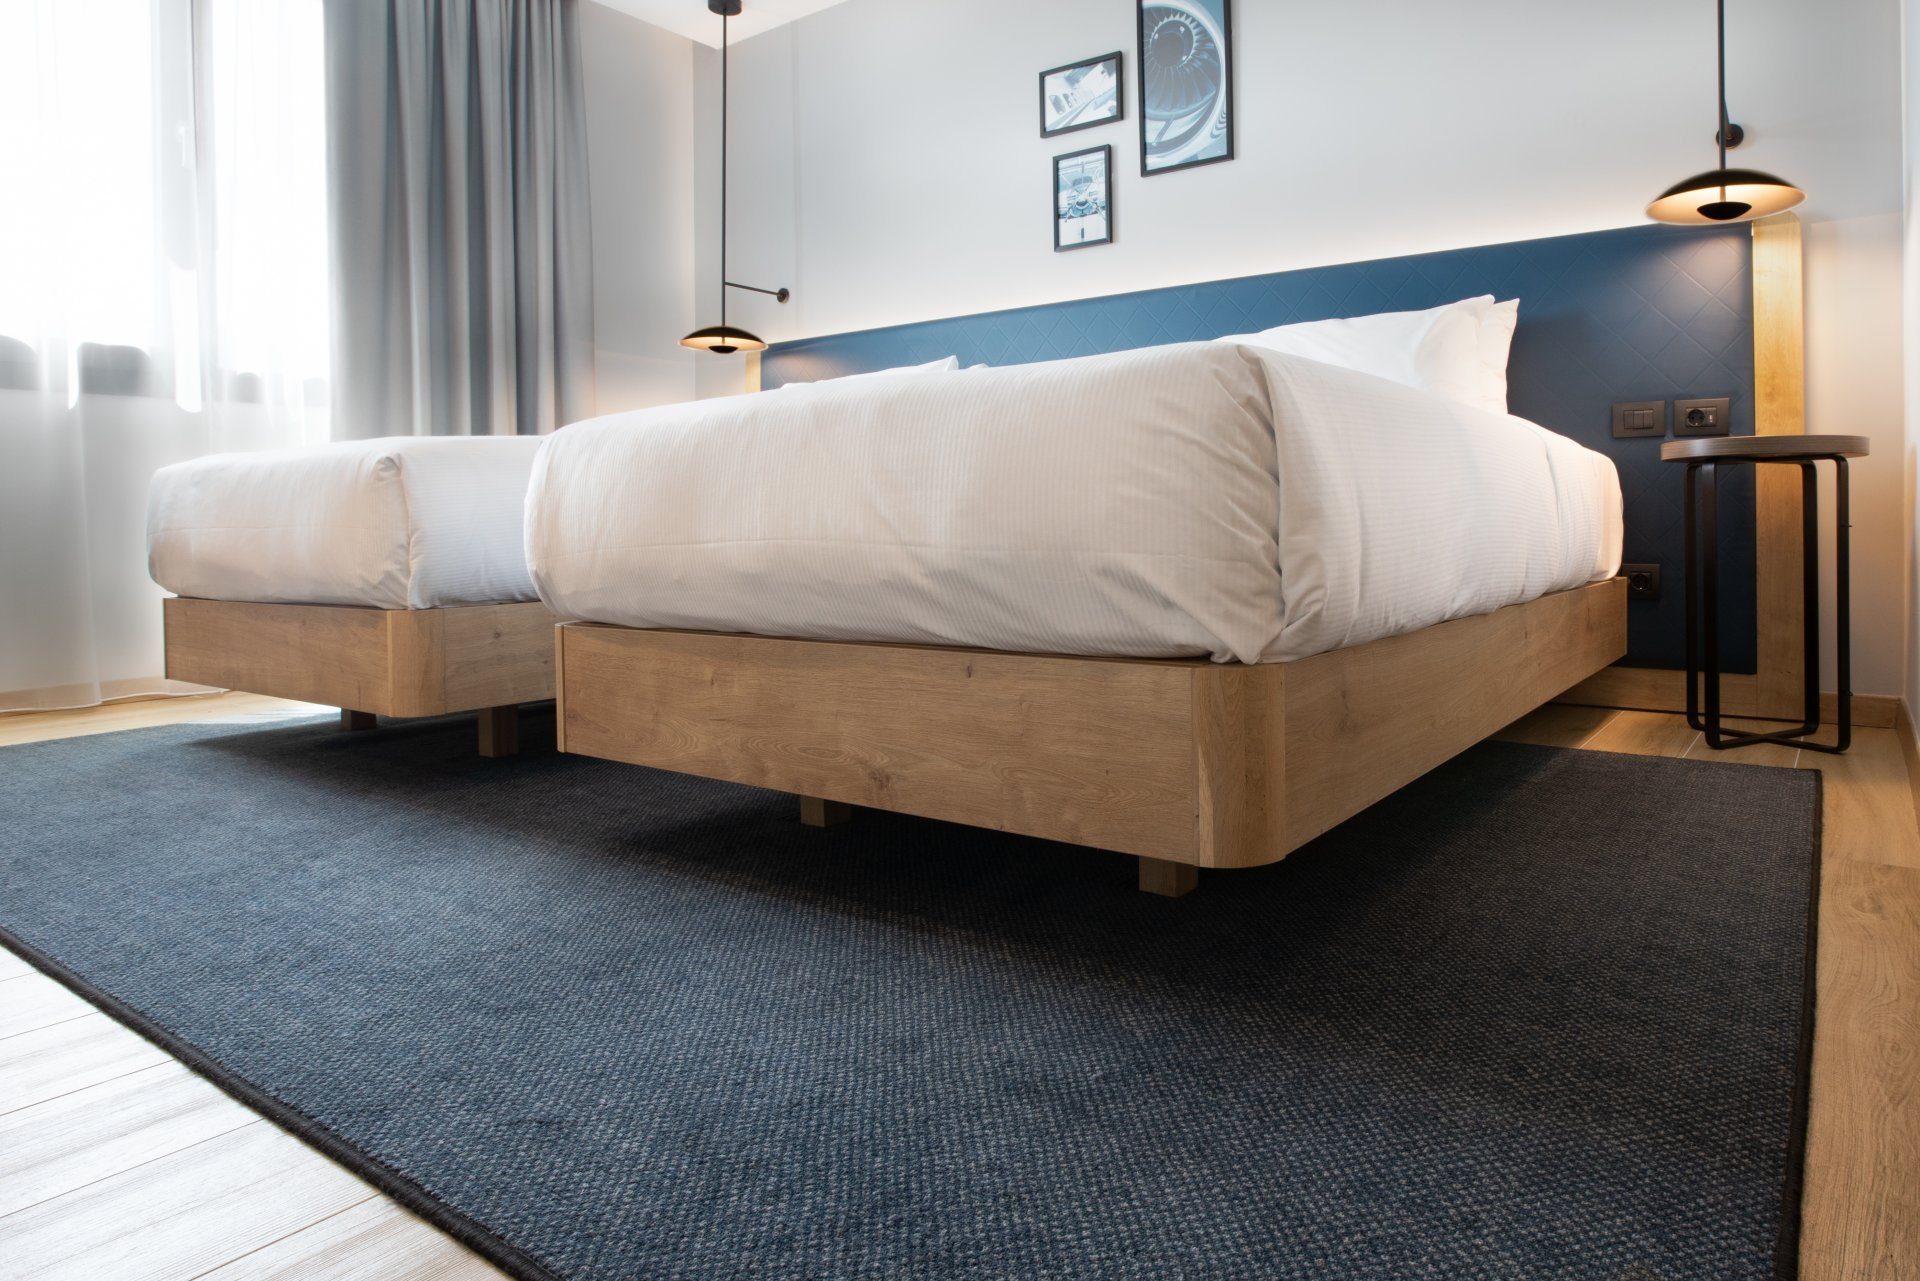 20200625-carpet-and-more-hilton-otopeni-13